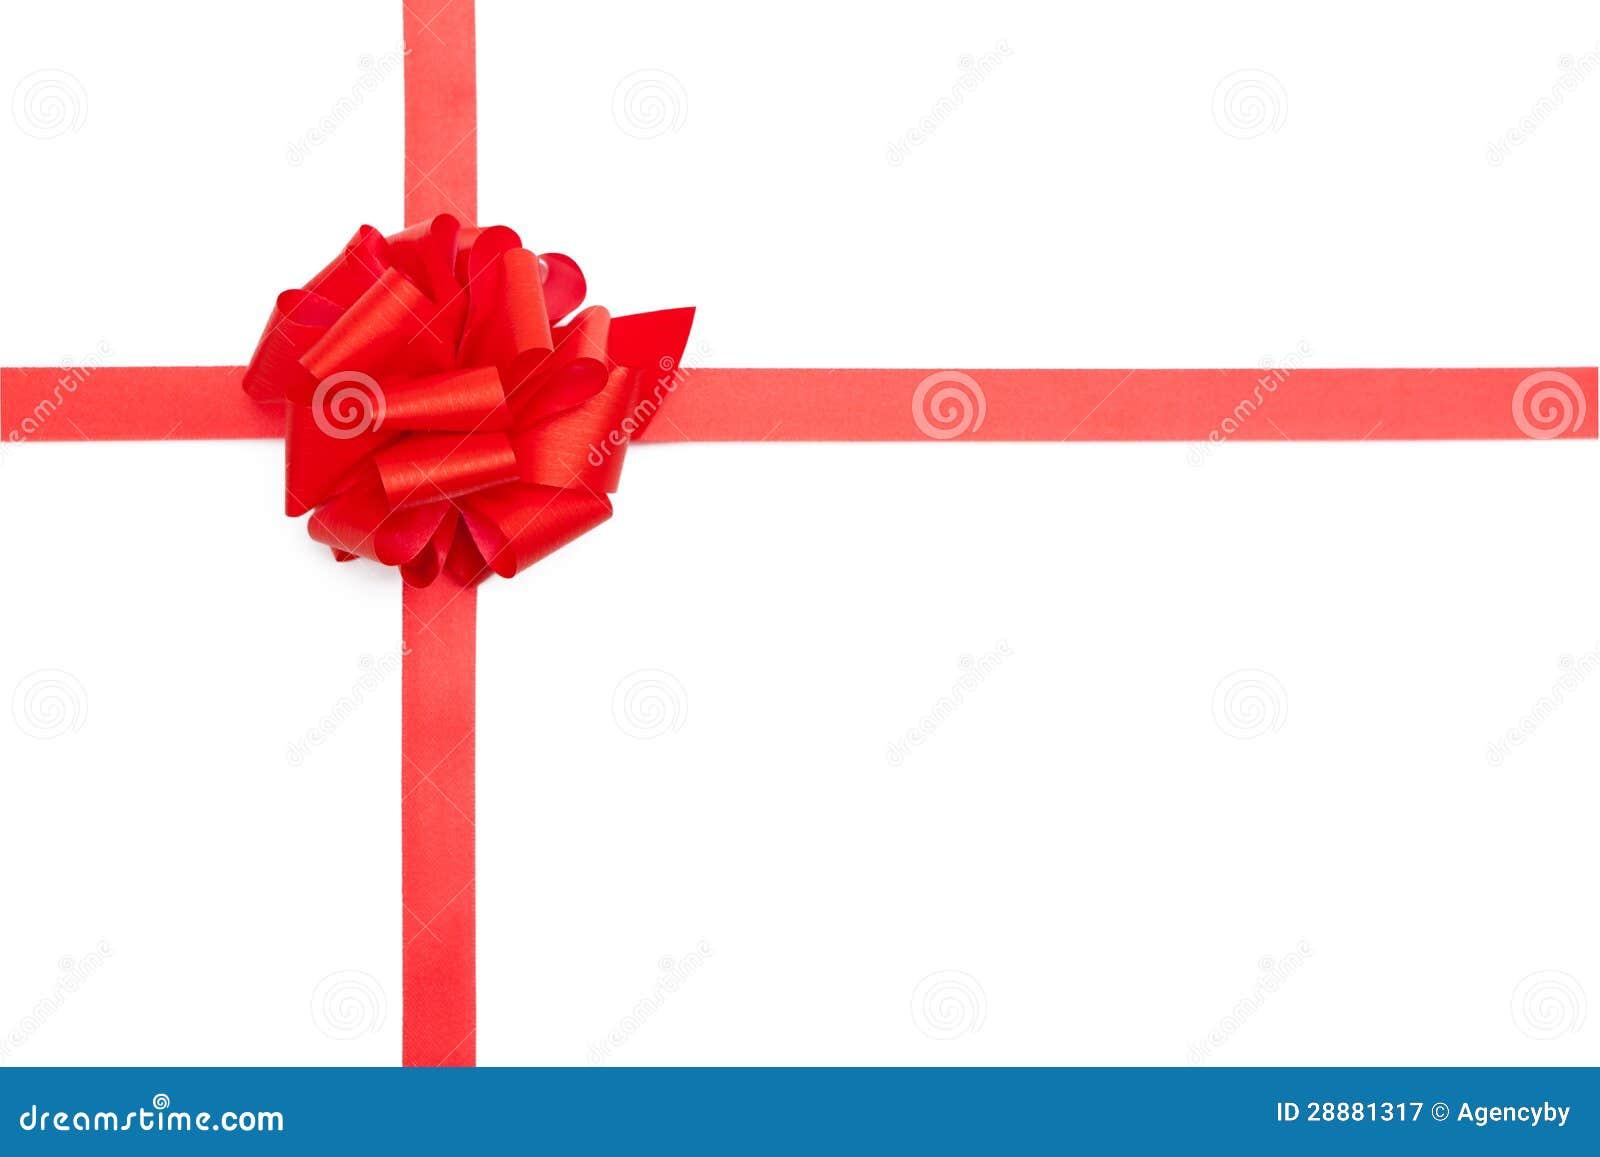 Red present ribbon bow stock image. Image of celebration